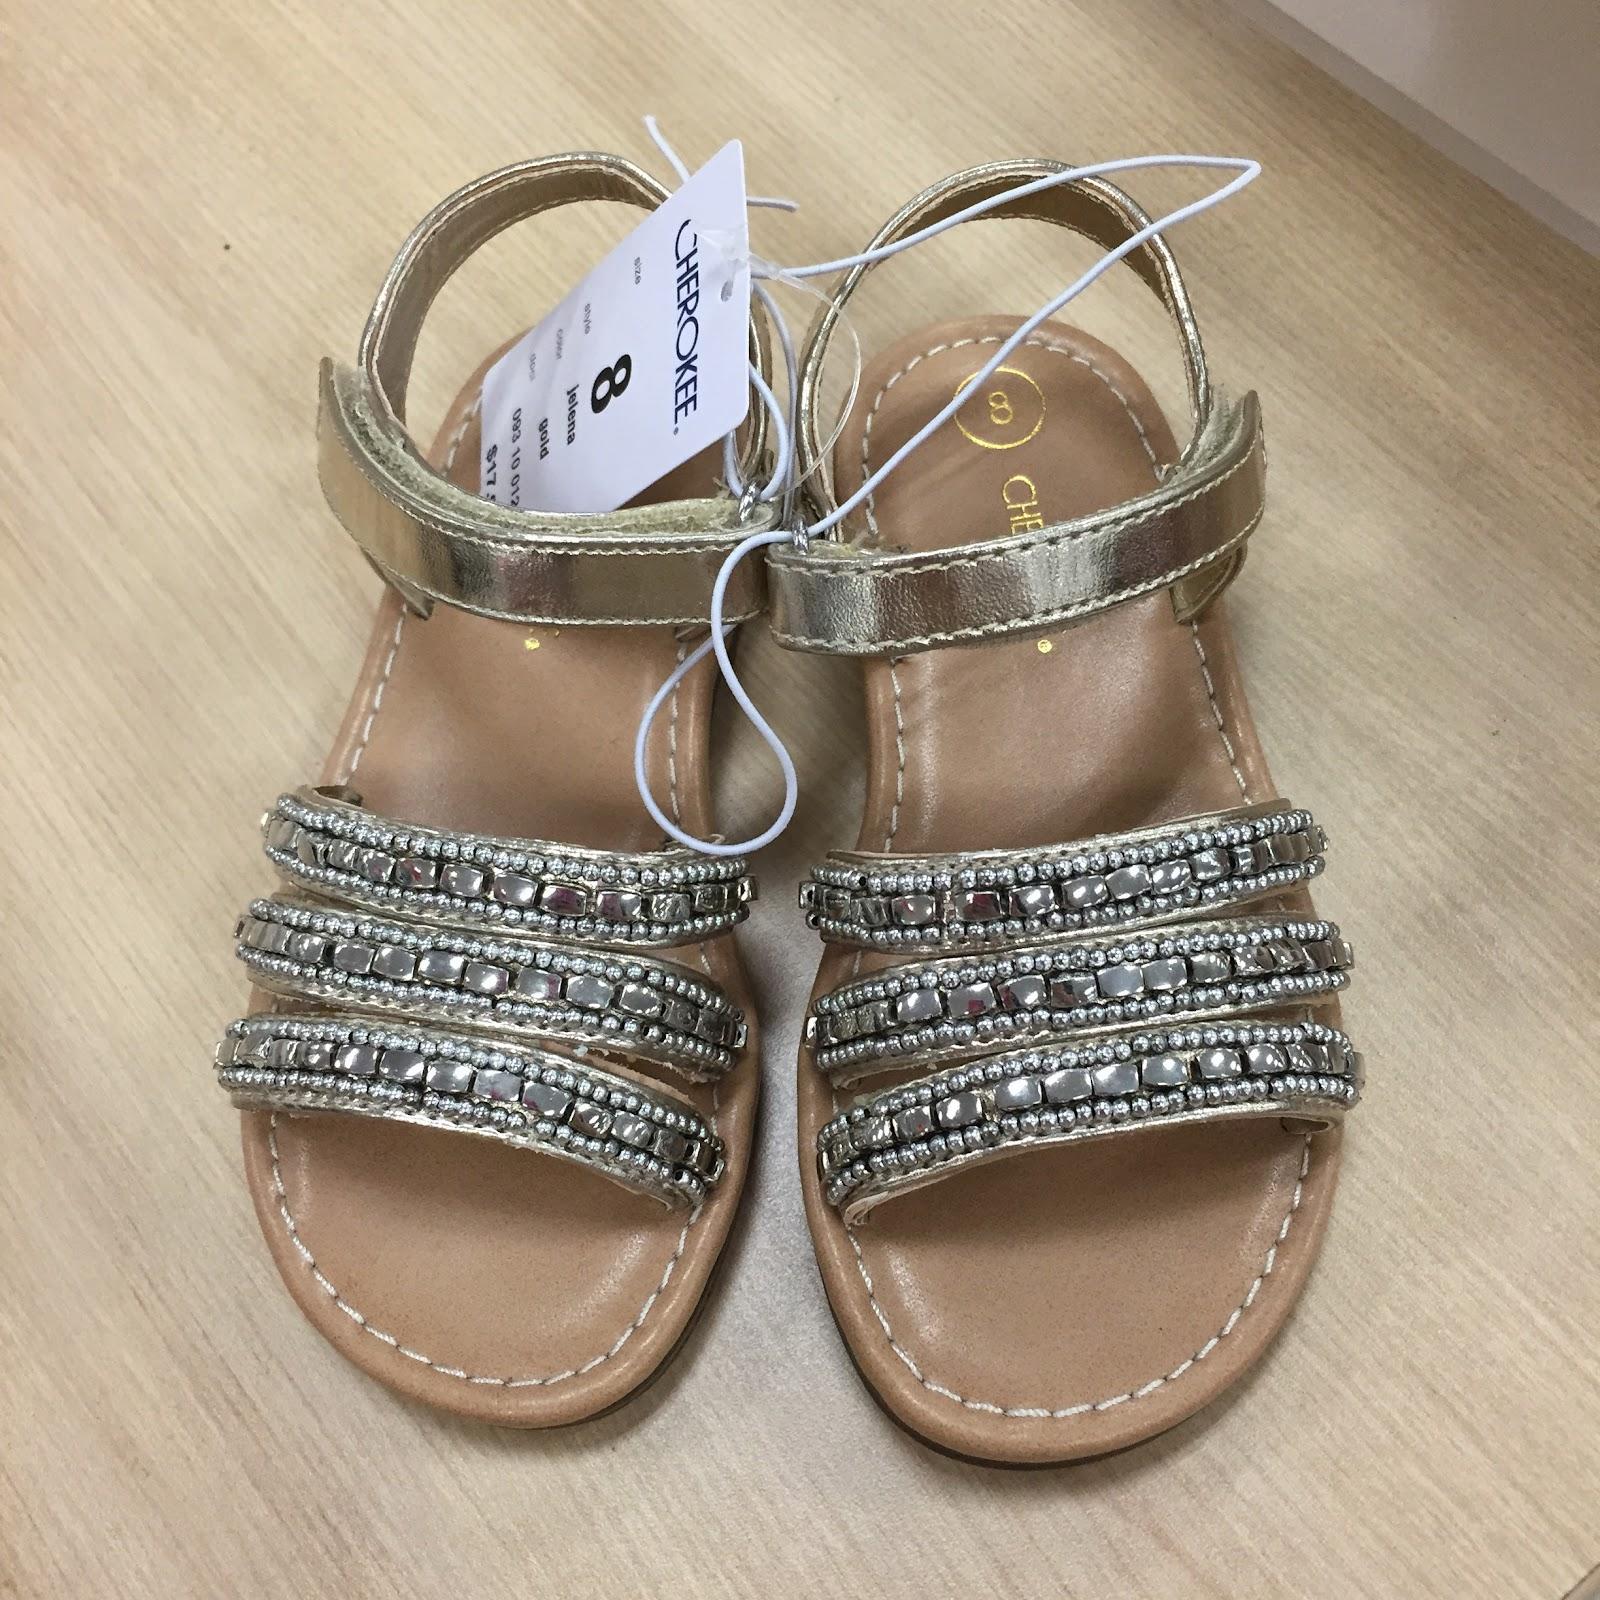 http://www.target.com/p/toddler-girl-s-cherokee-jelena-sandals-gold/-/A-16628760#prodSlot=_3_23